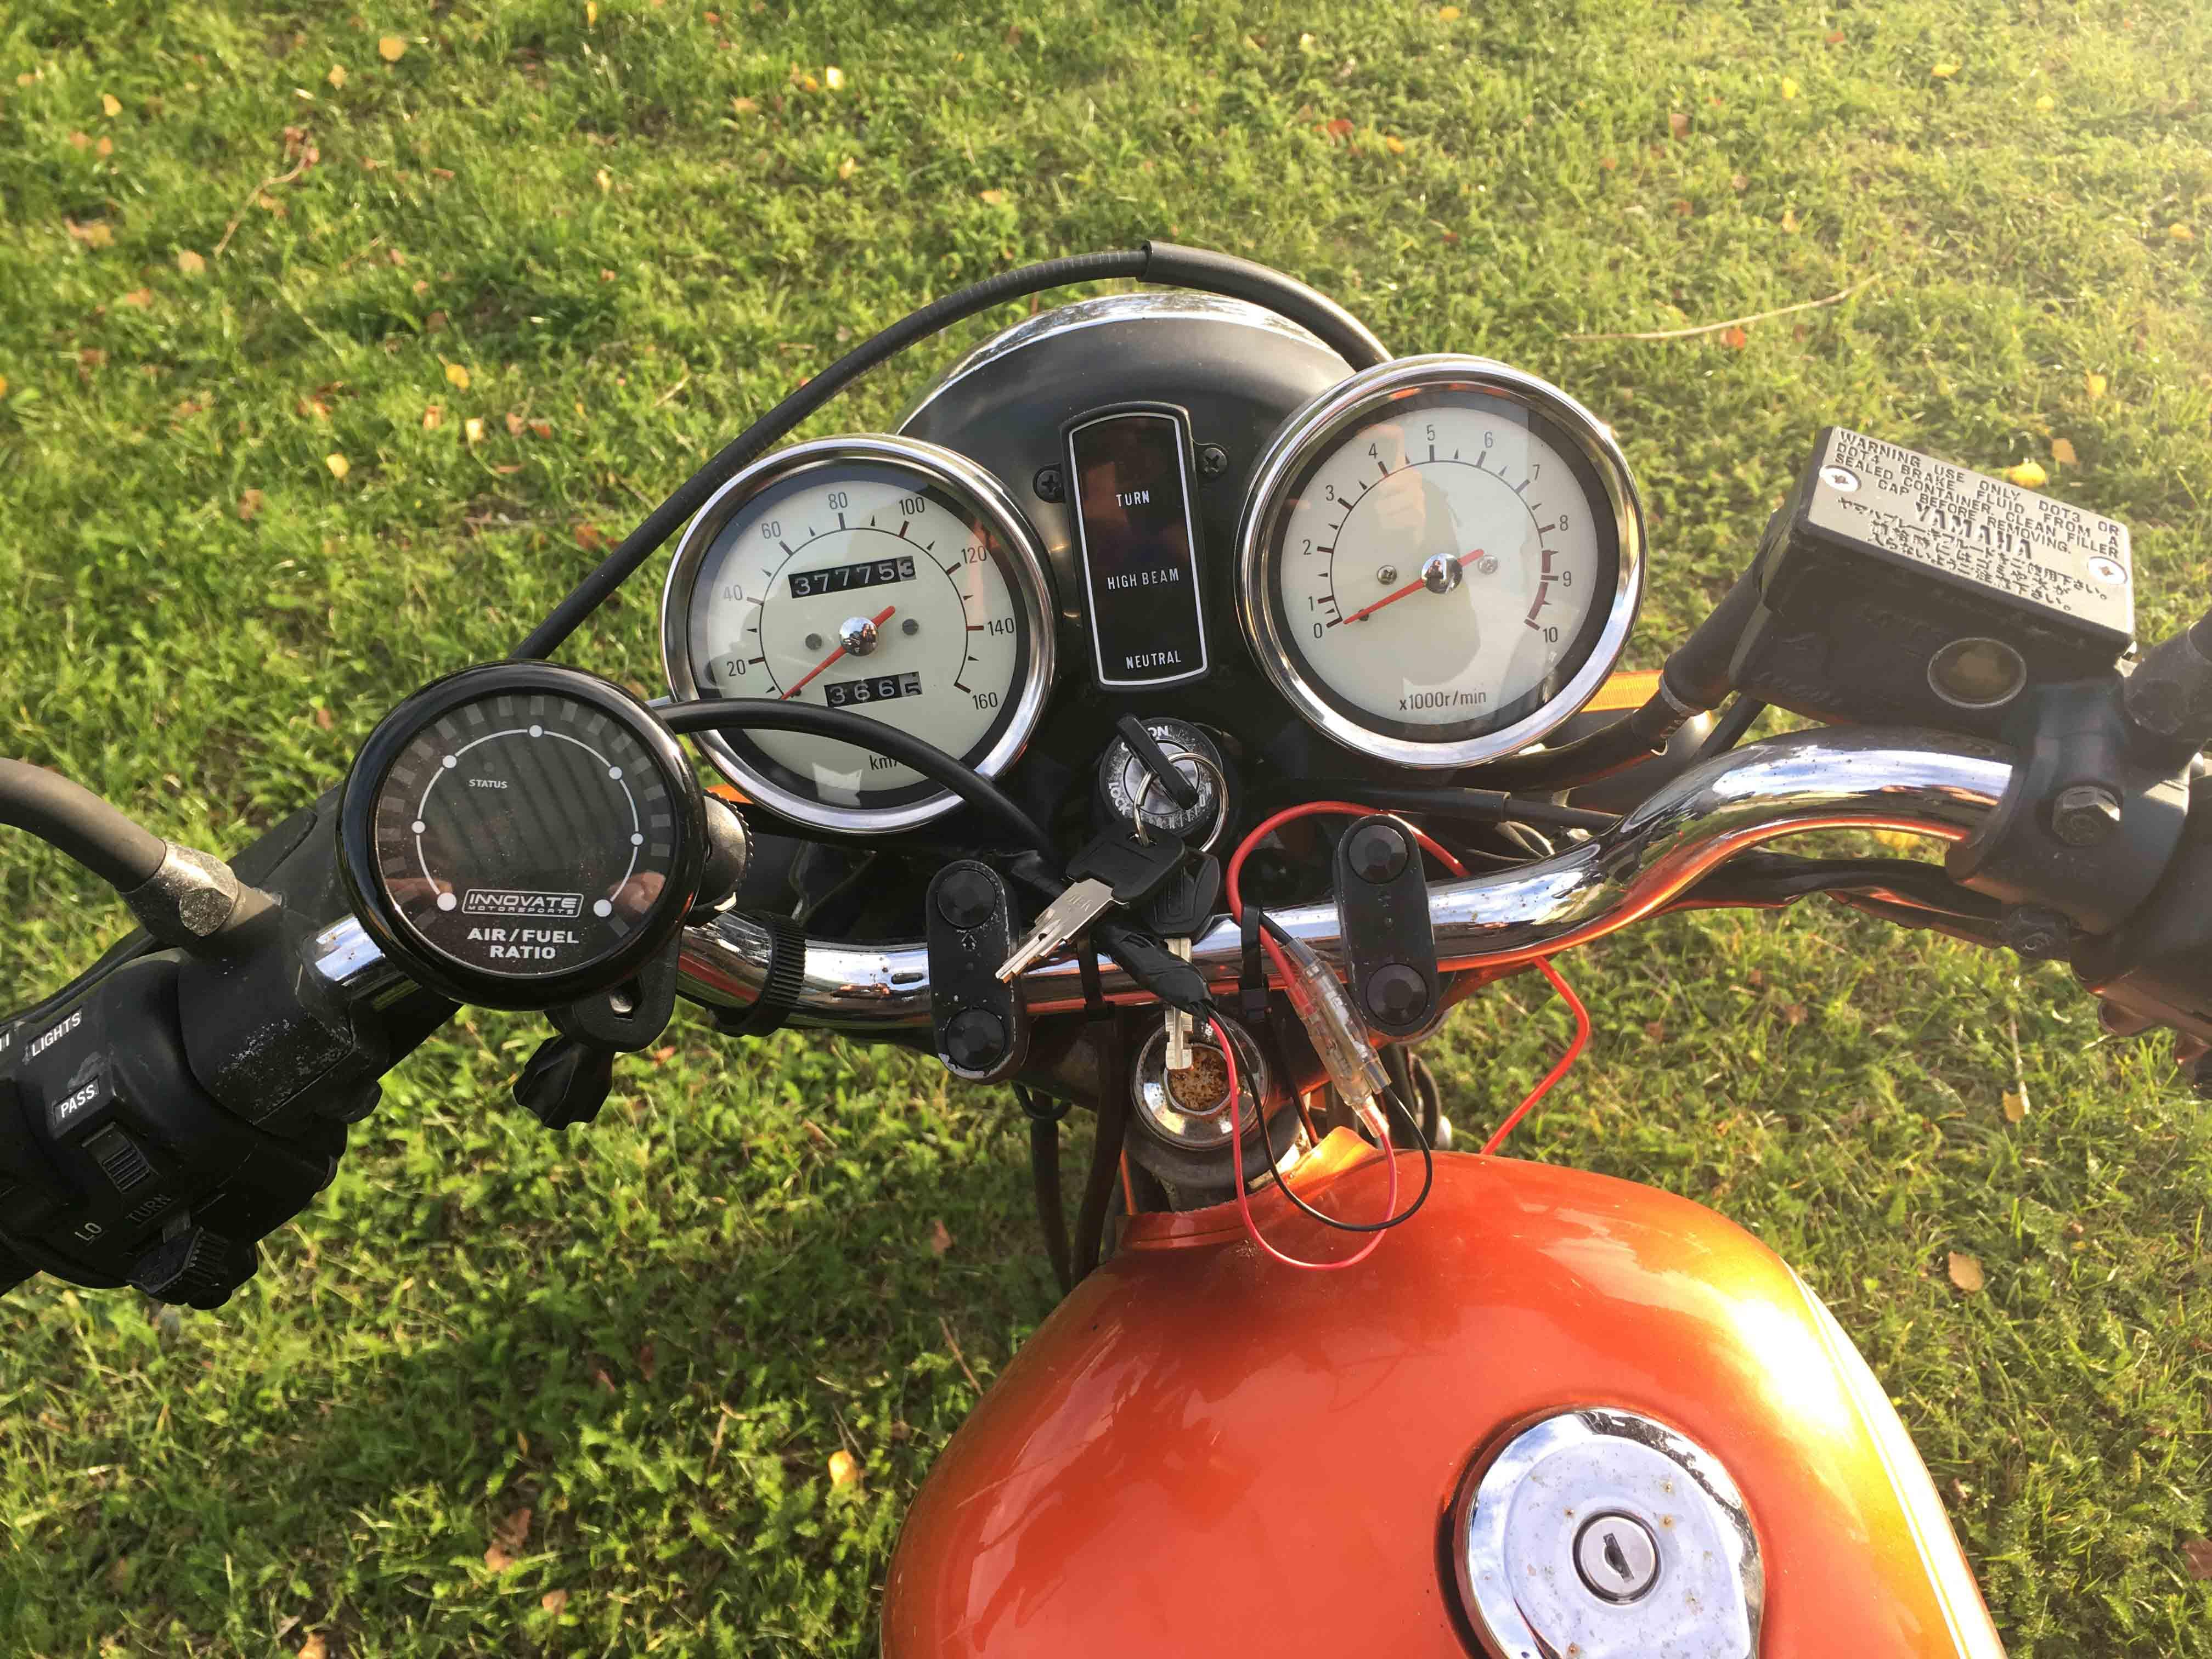 SR250 Air/Fuel Meter